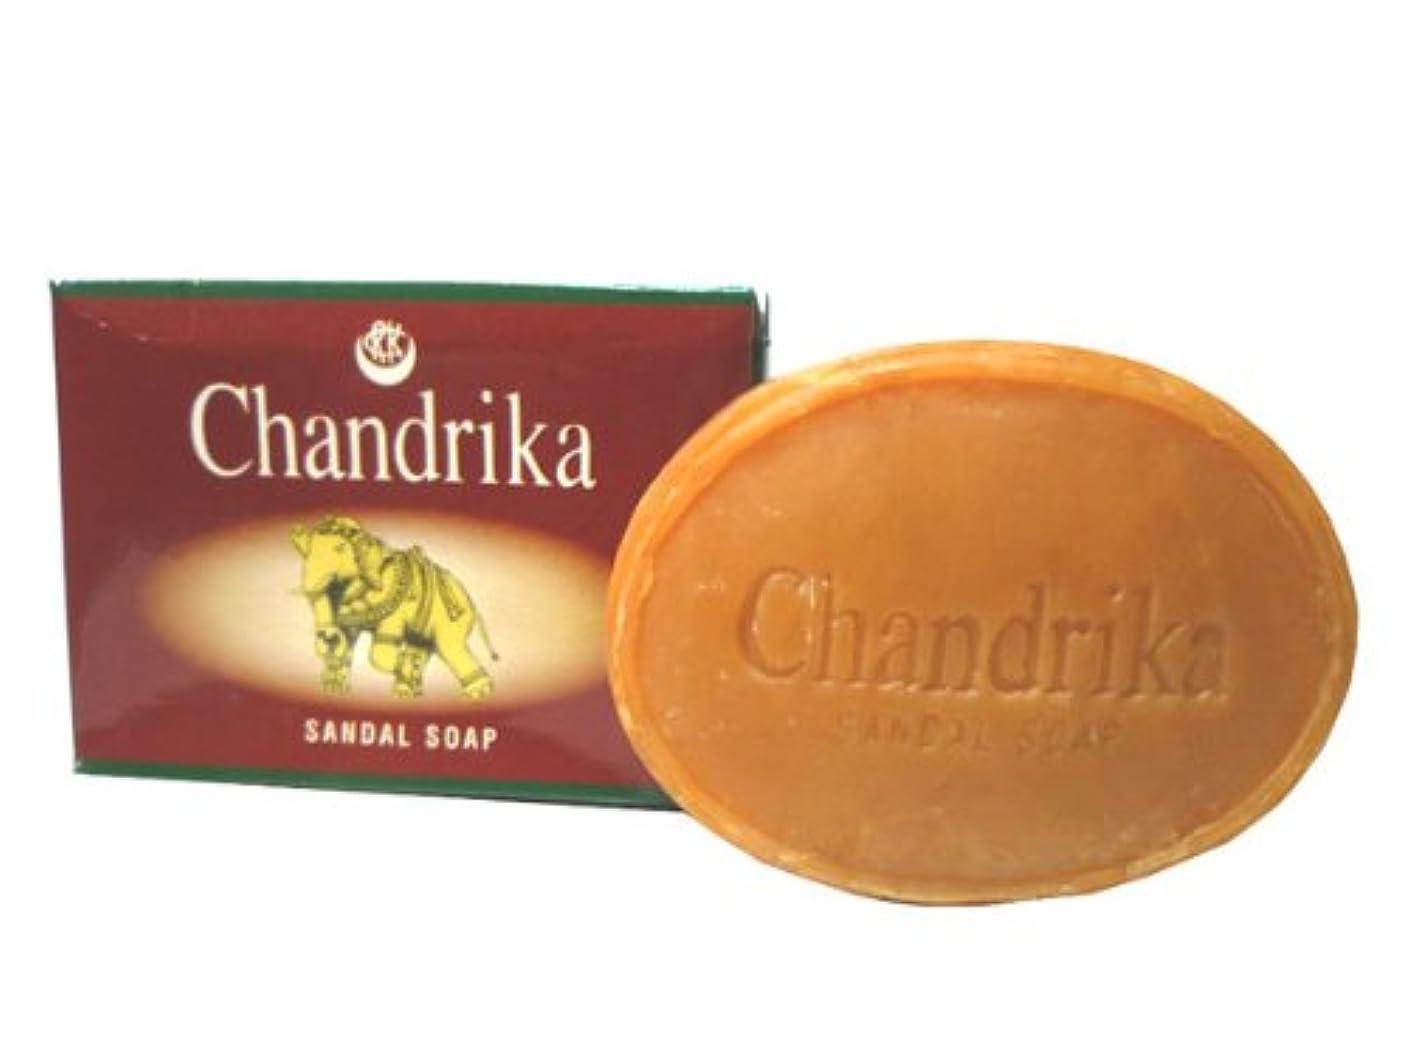 Chandrika Chandrika Sandal Bar Soap 75 gm by Chandrika